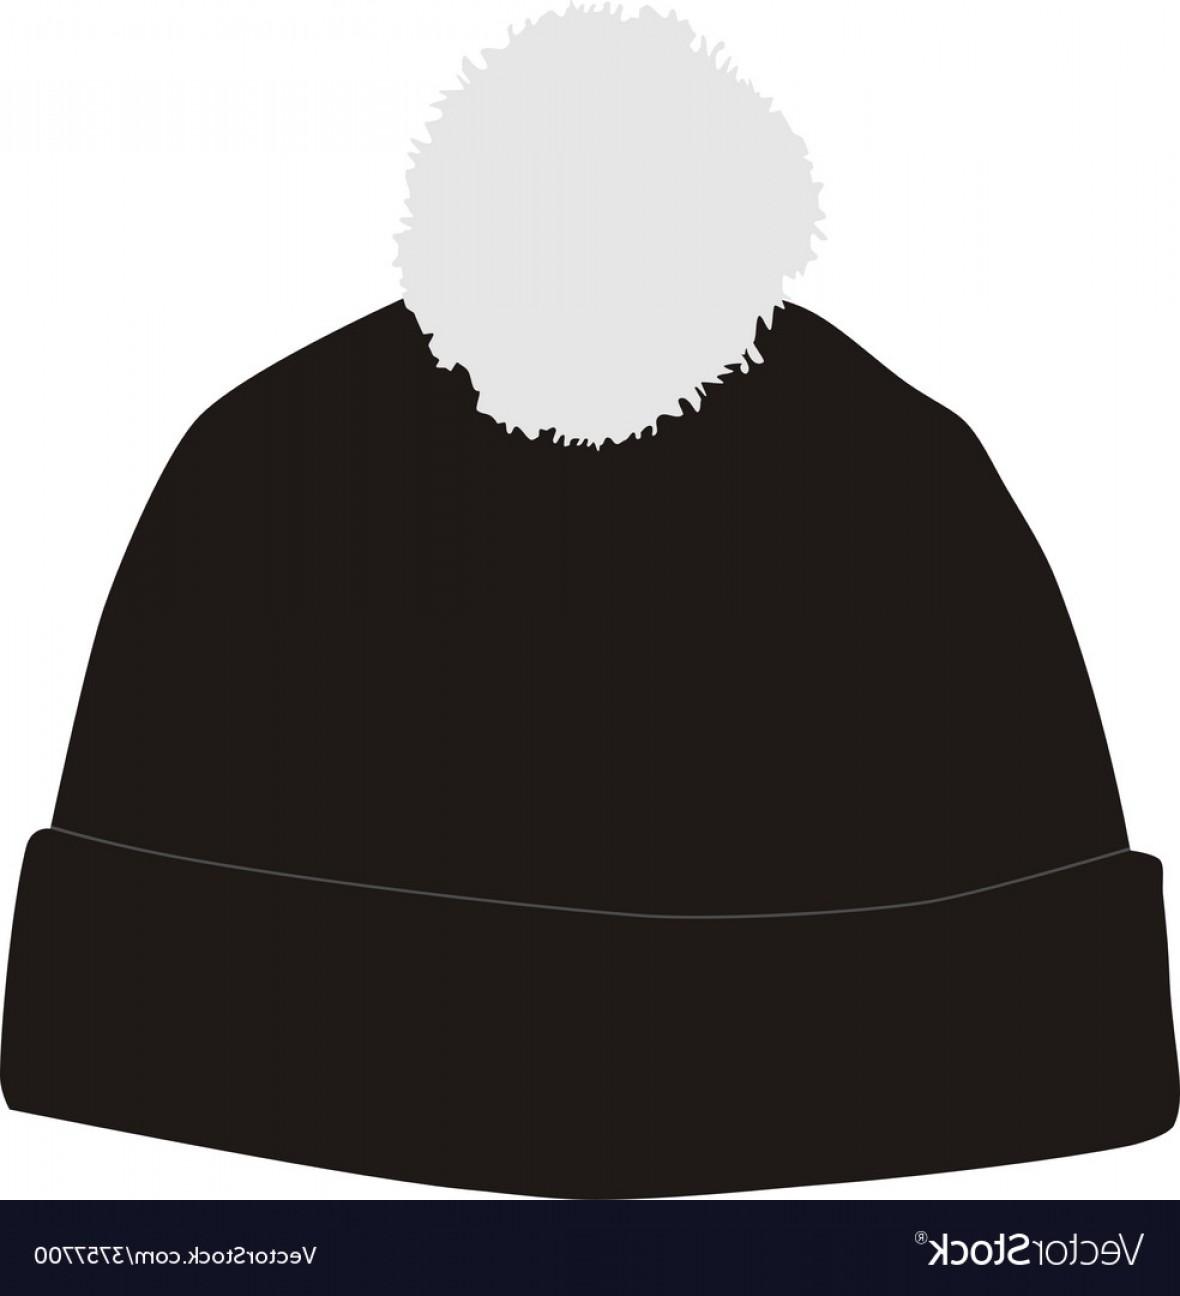 1180x1296 Black Winter Hat With Pompom Vector Geekchicpro